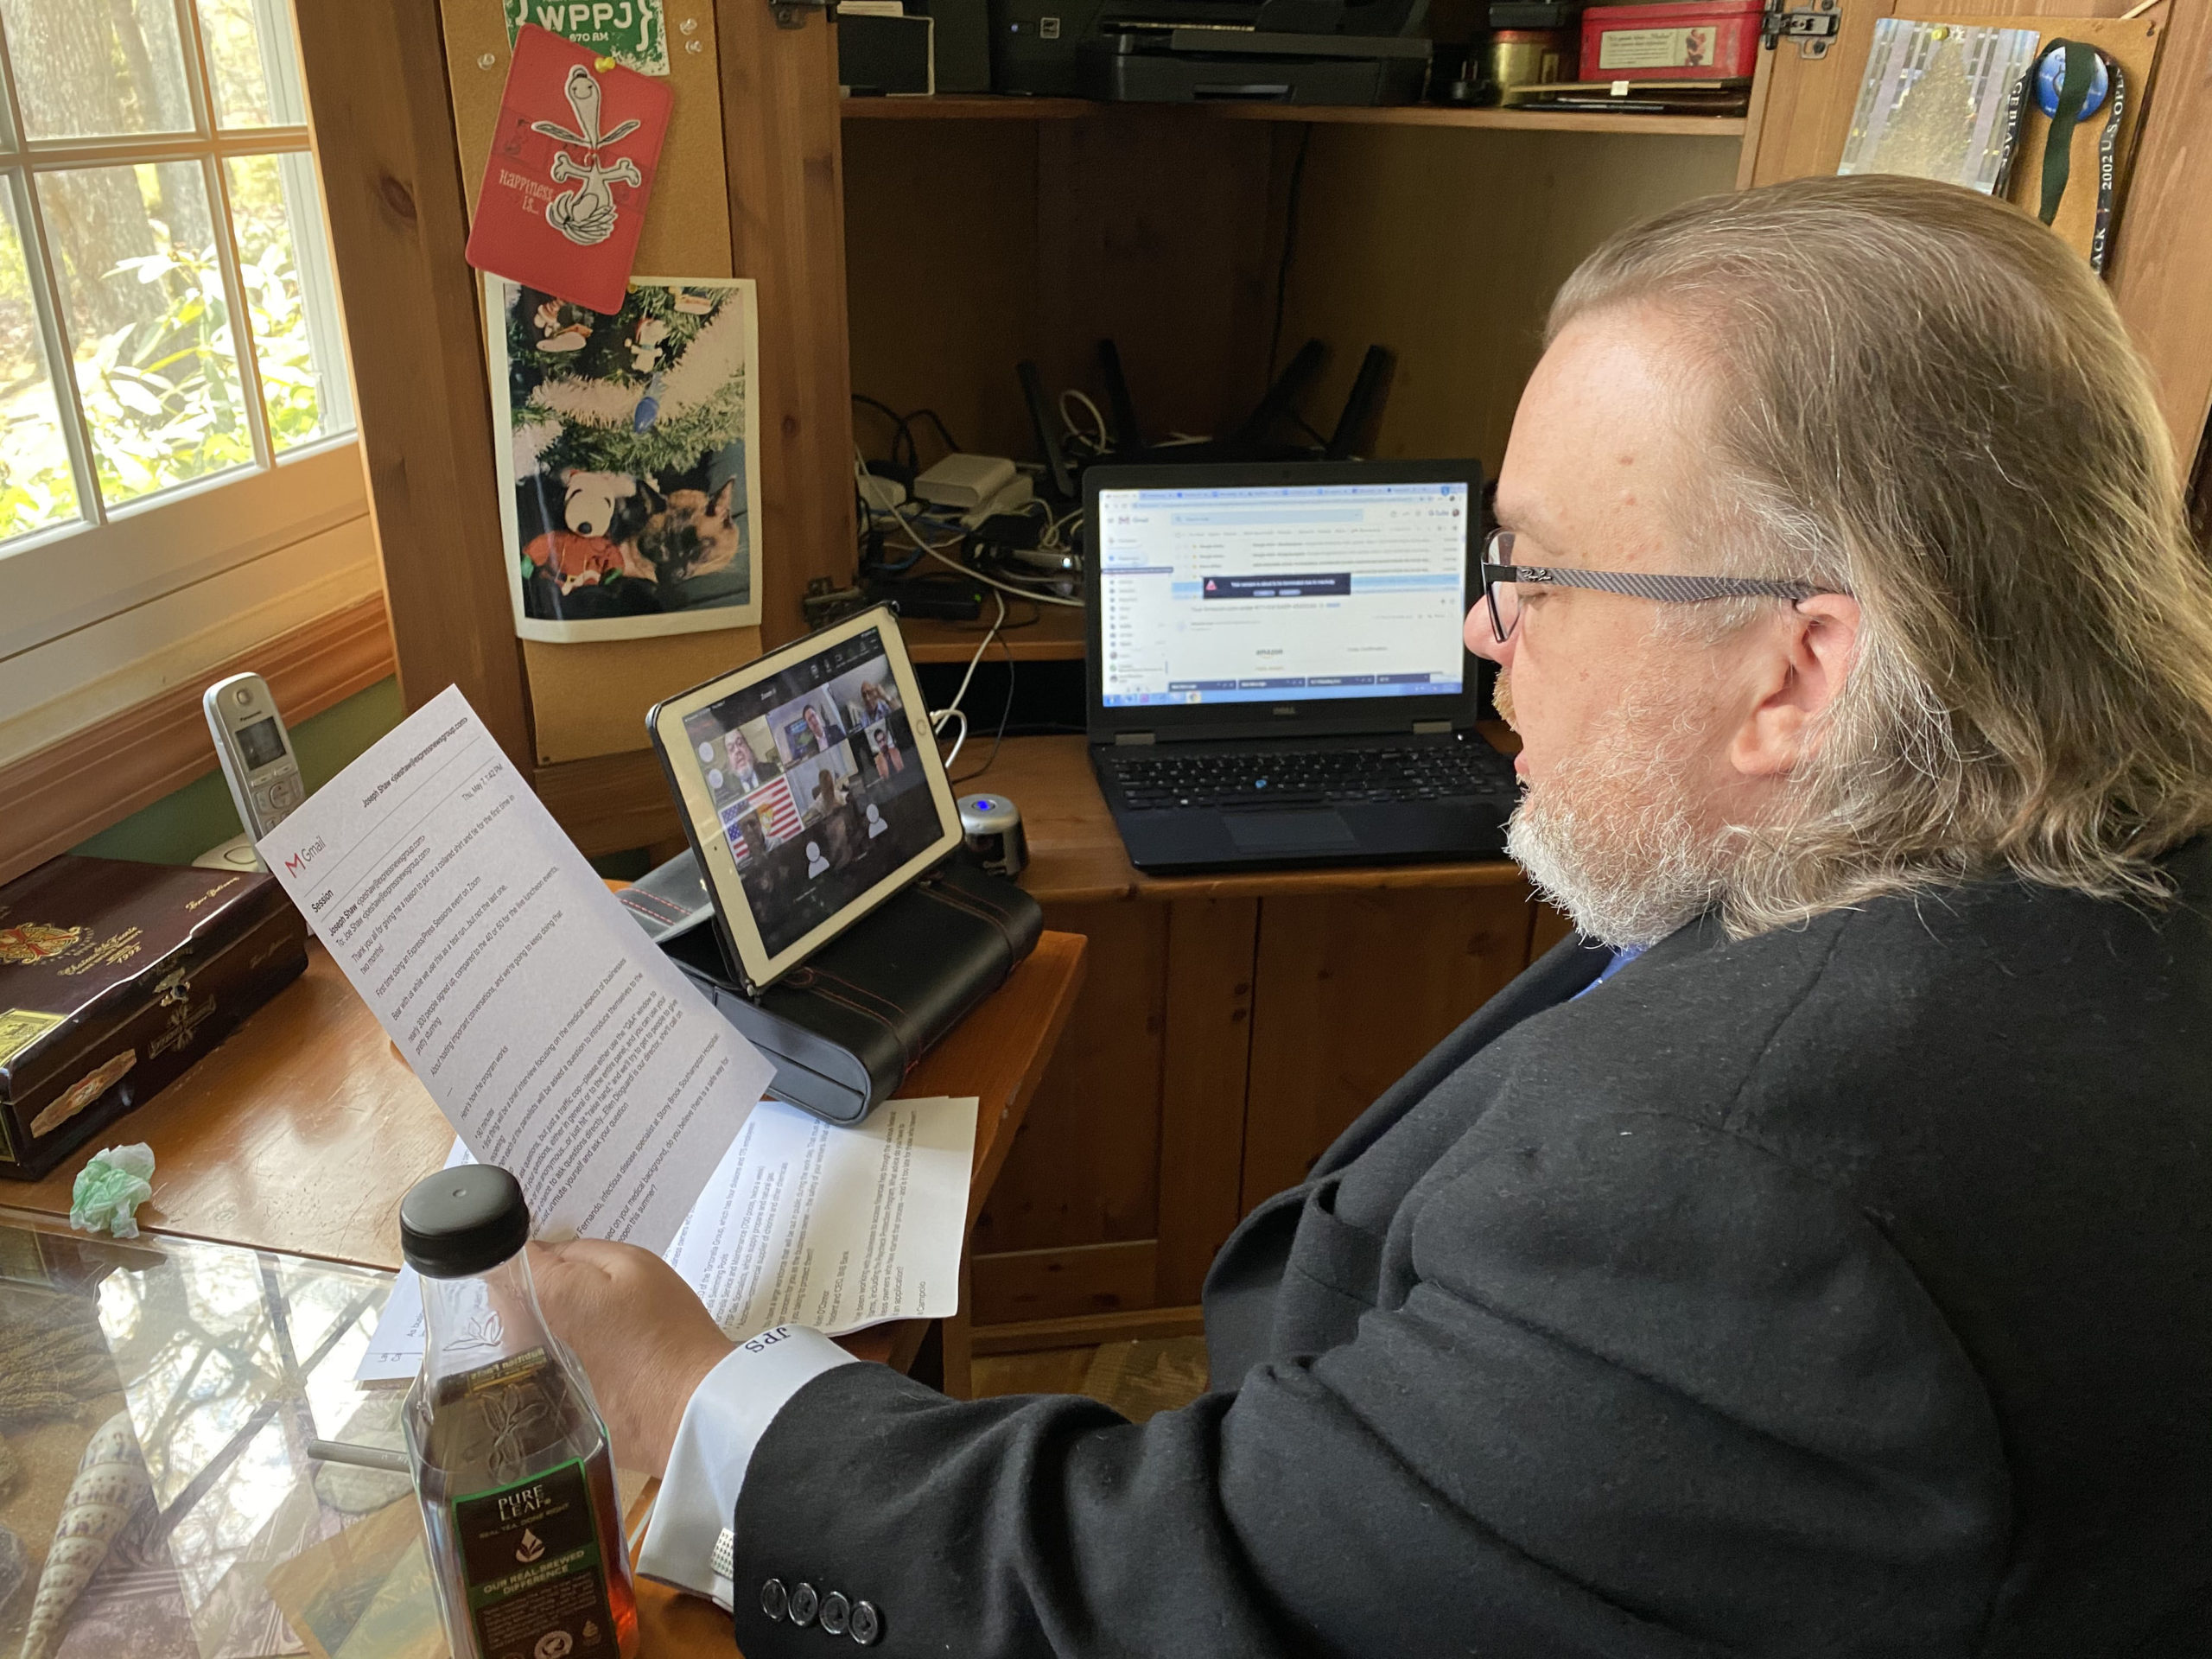 Moderator Joe Shaw during the Express Virtual Session.